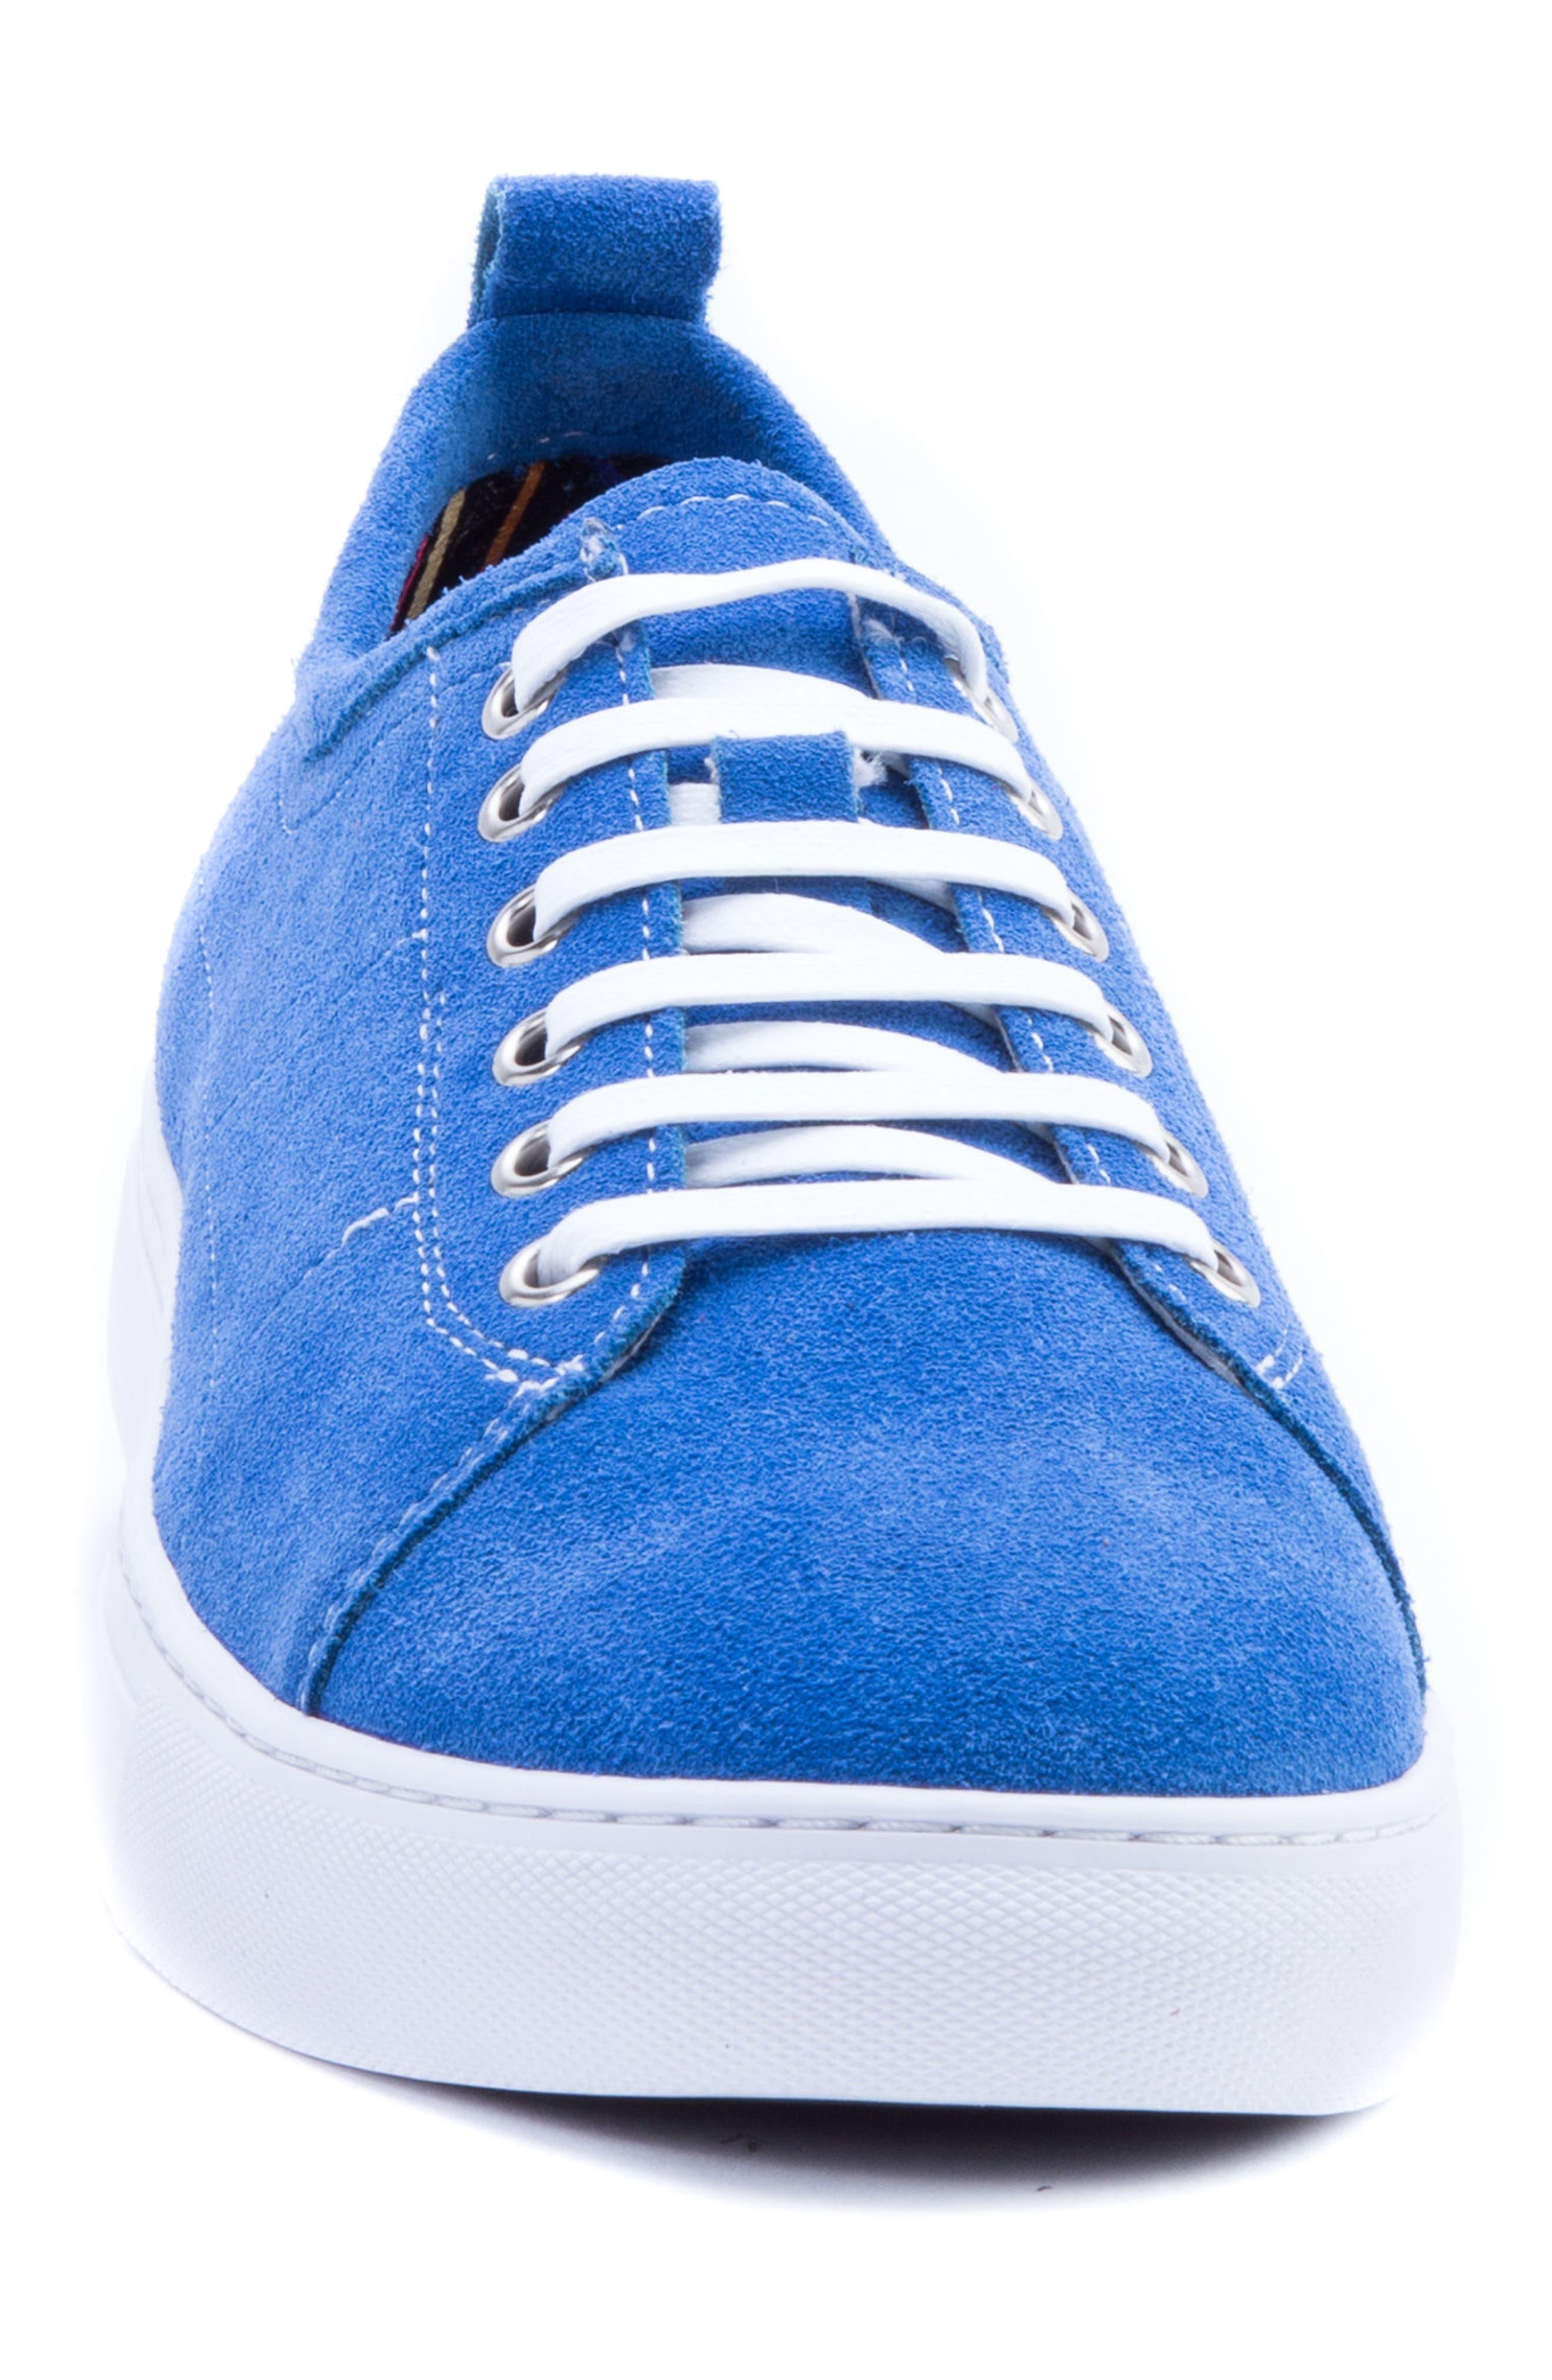 Ernesto Low Top Sneaker,                             Alternate thumbnail 4, color,                             ROYAL SUEDE